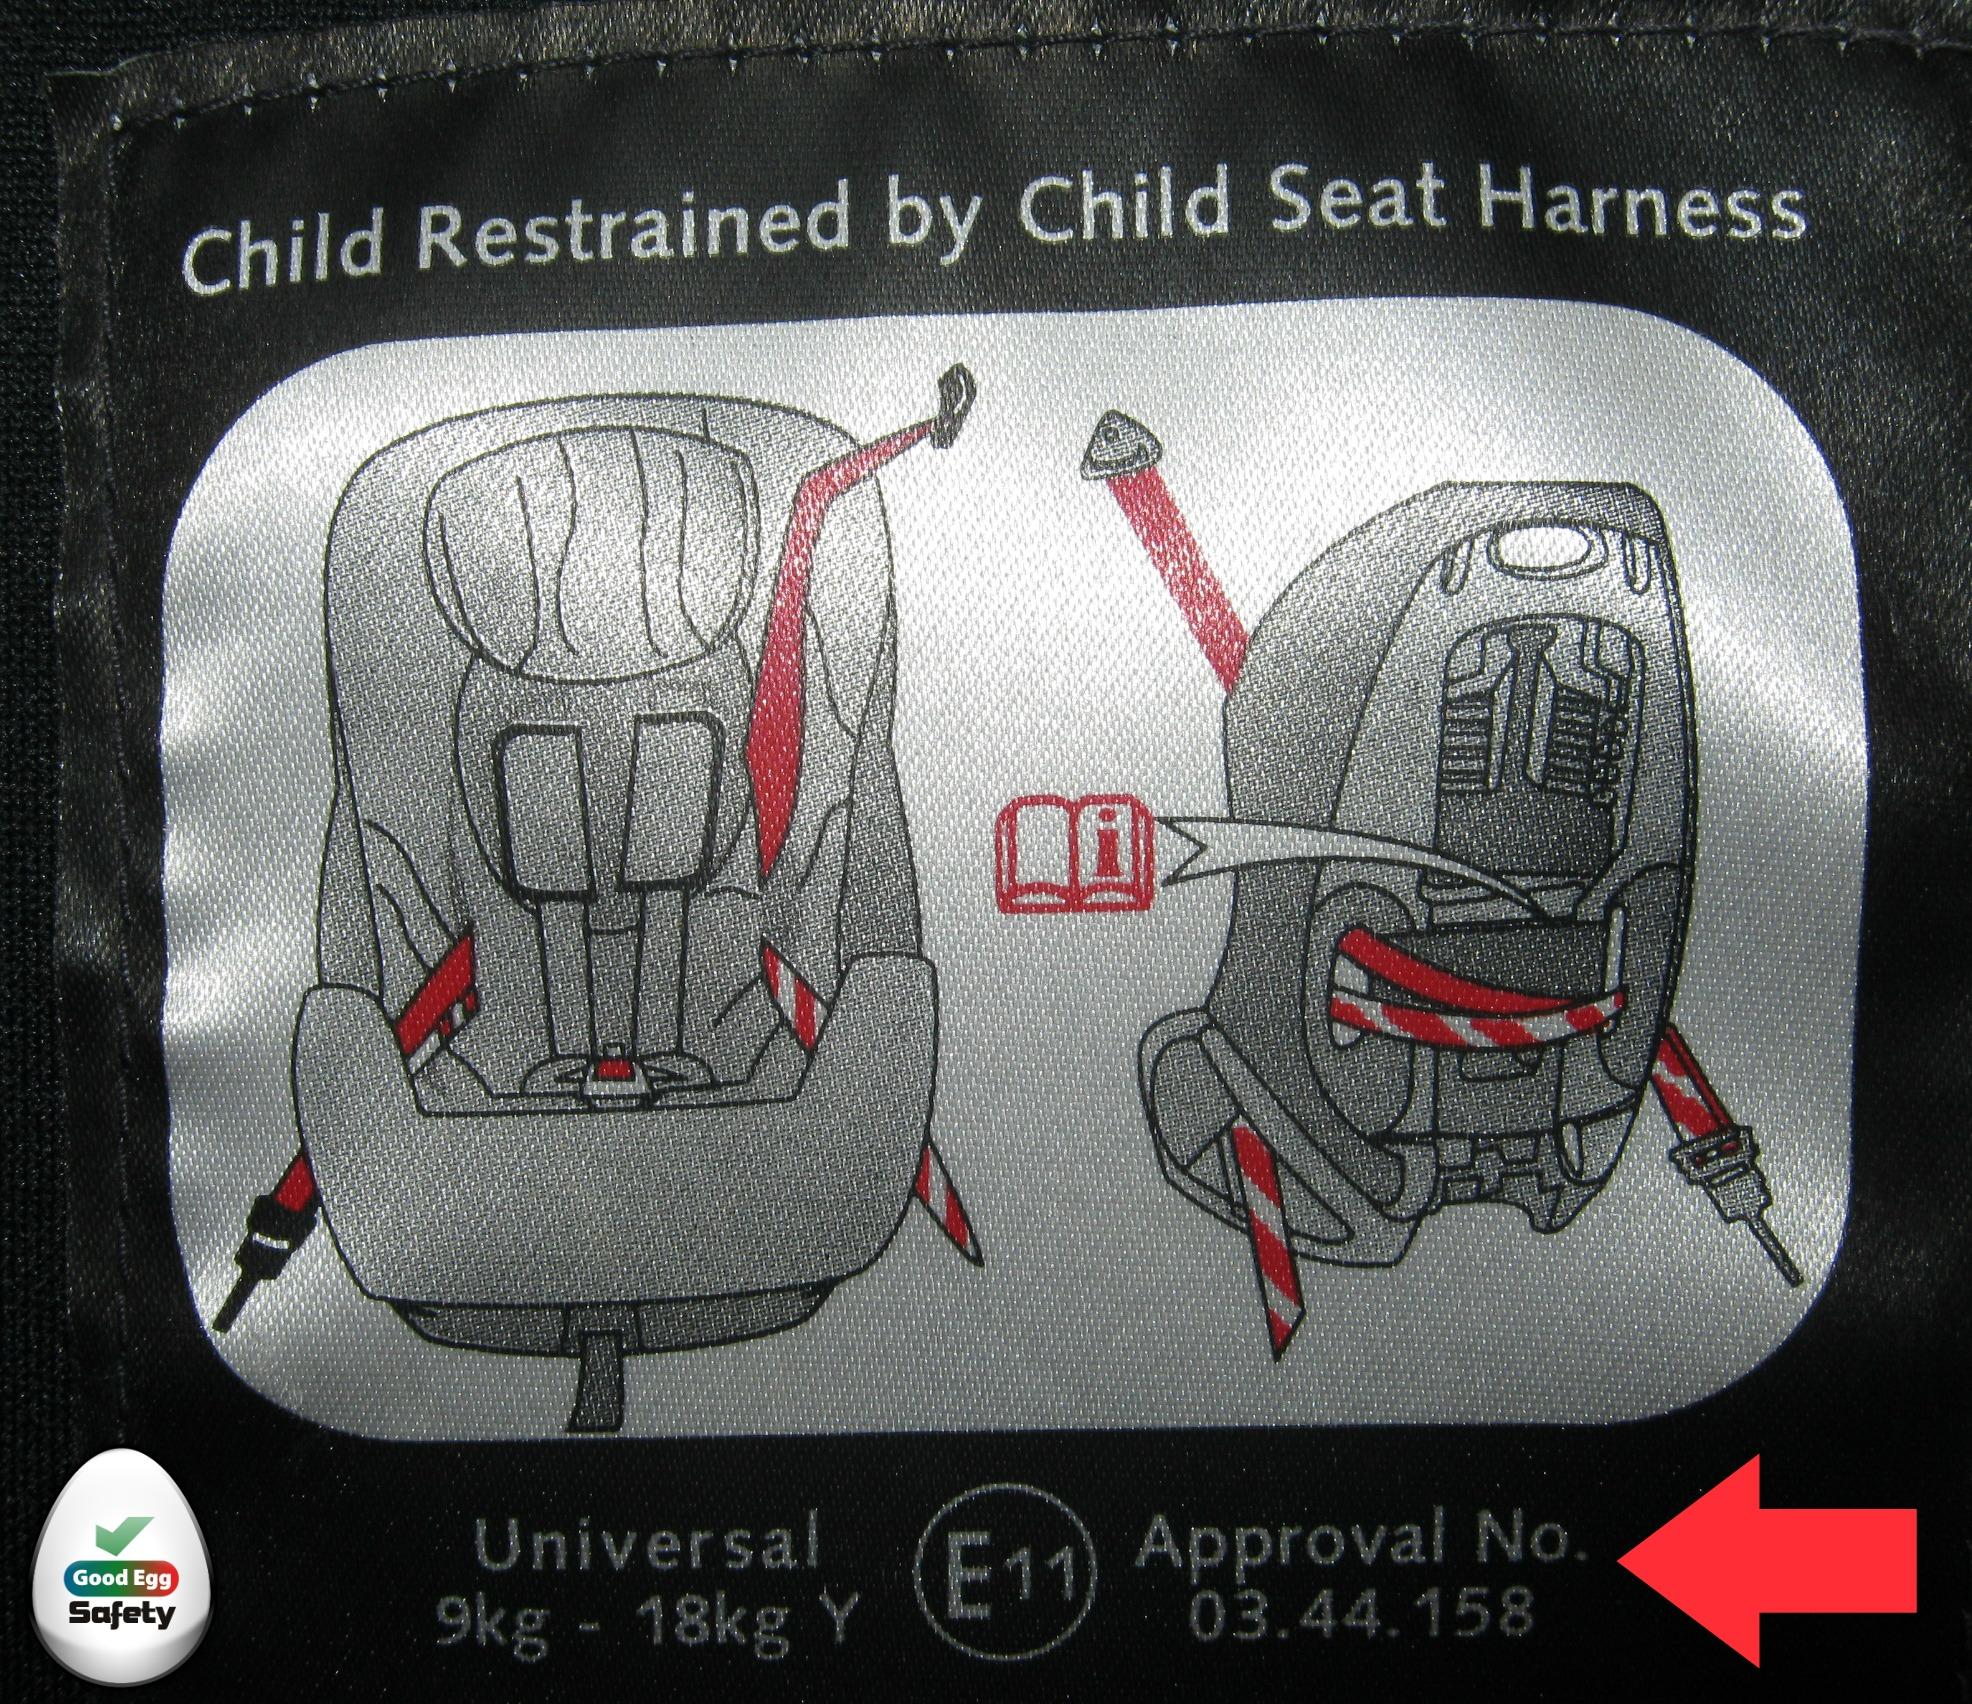 Reusing Child Car Seats